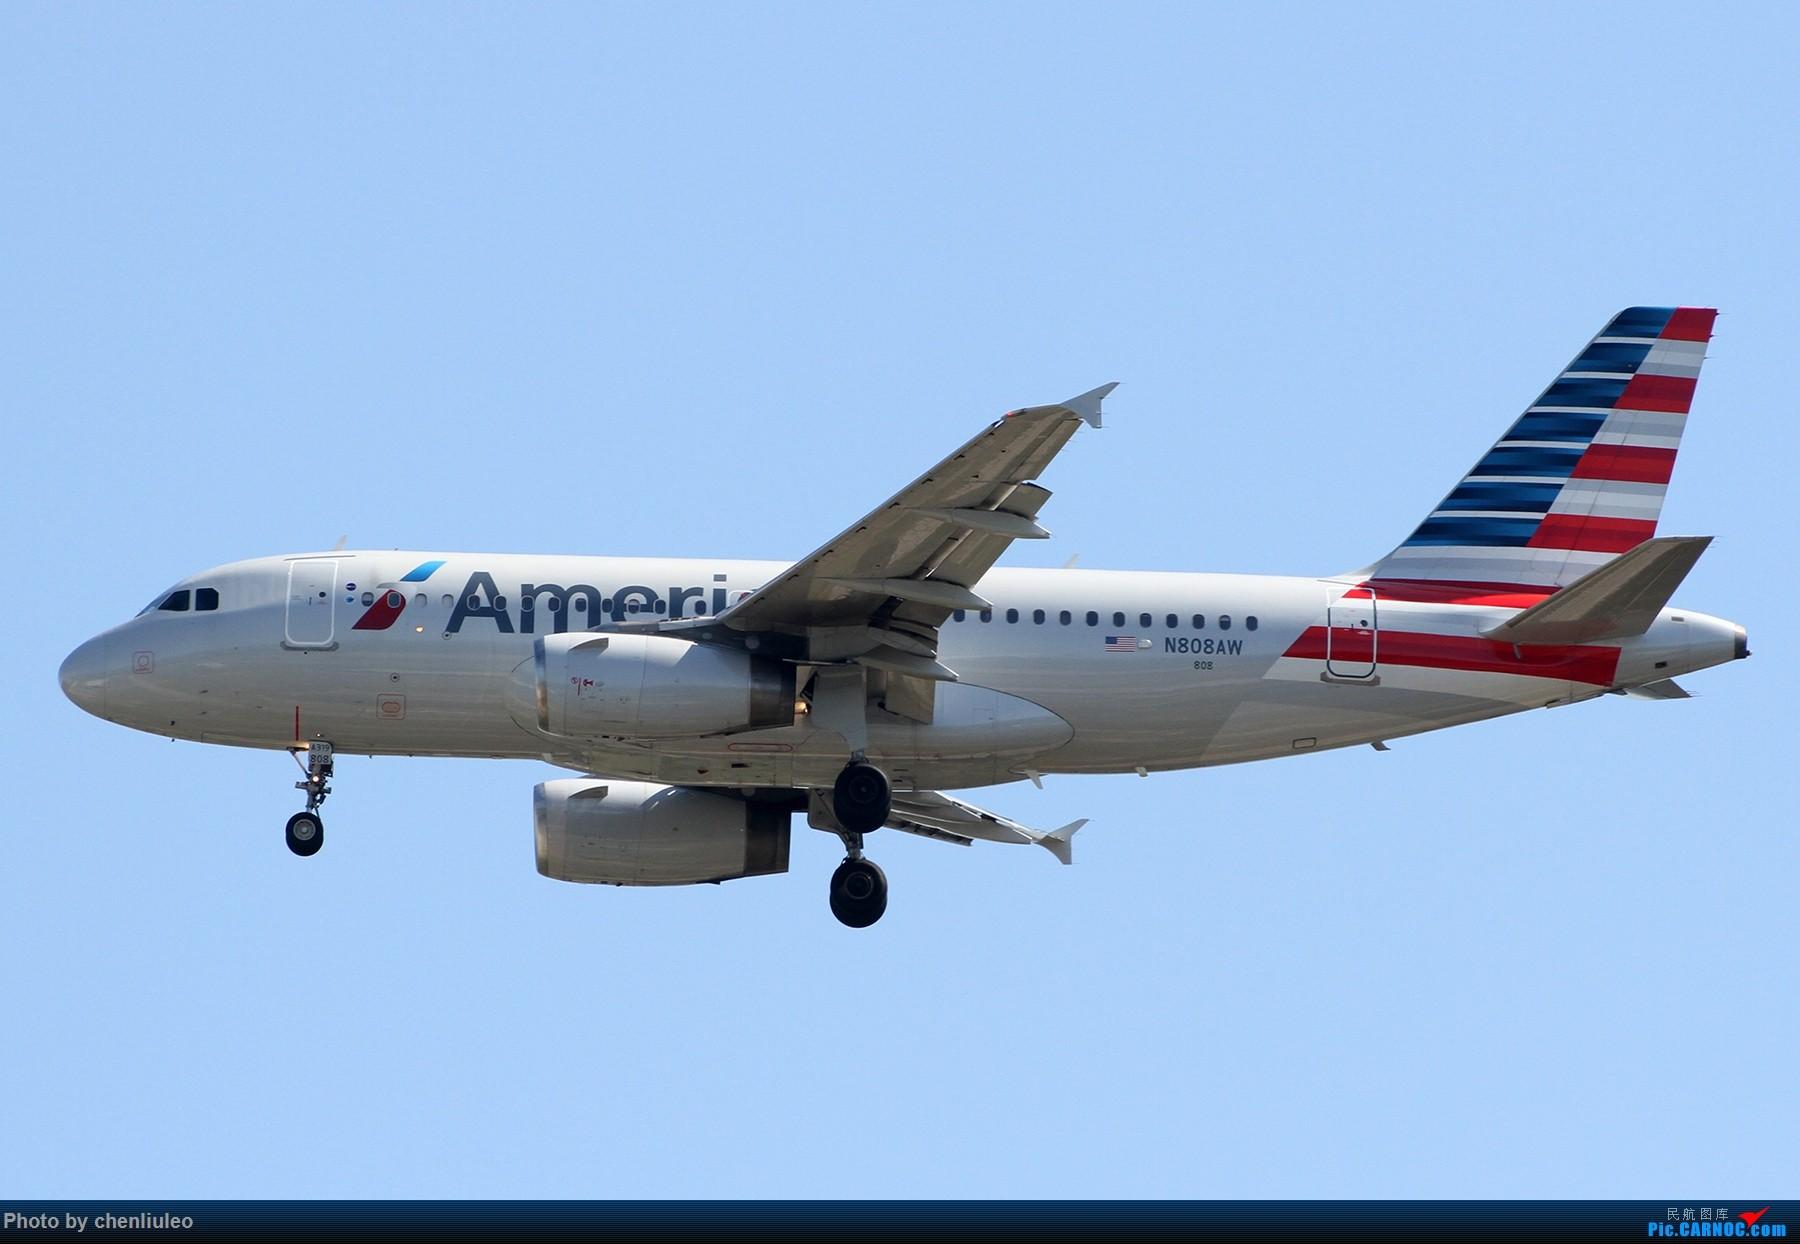 Re:[原创]【北美飞友会】本来是去等西南航空的新加州一号彩绘 结果有意外惊喜 美军C-40C AIRBUS A319-100 N808AW 美国圣路易斯机场